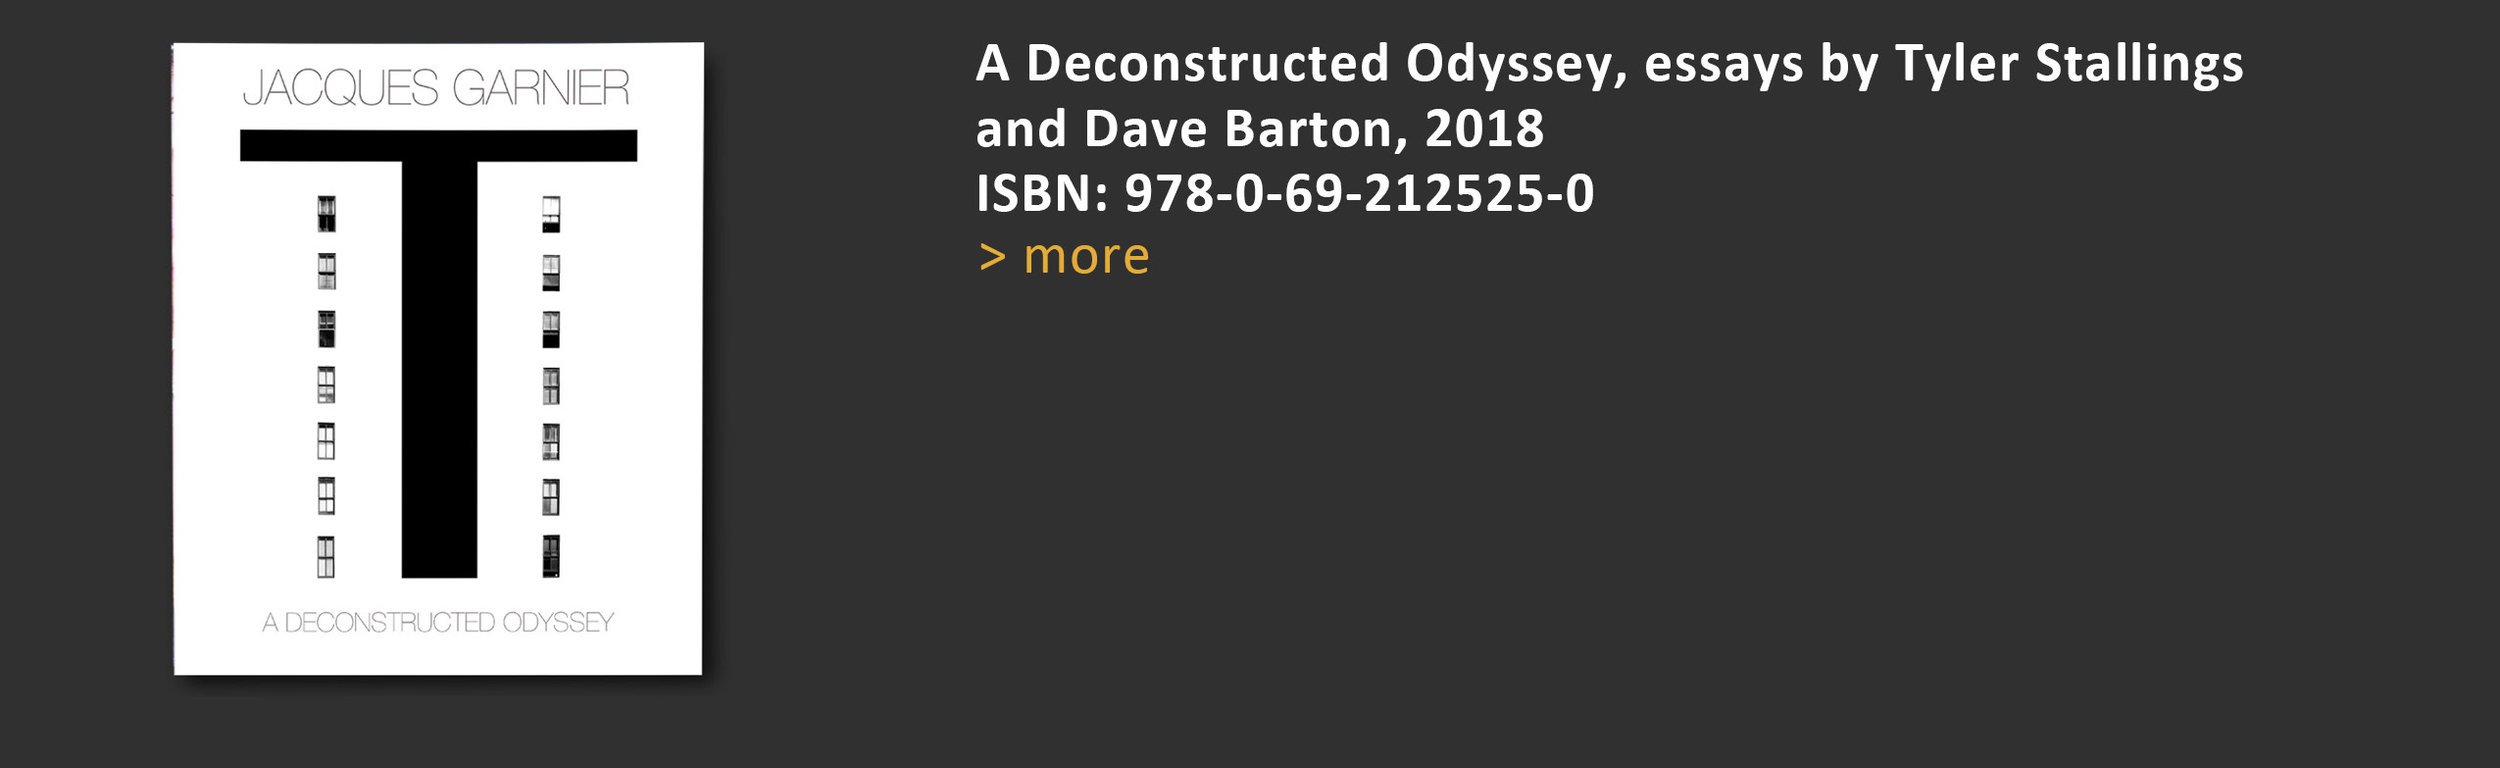 Decon_Odyssey_panel_March_2019.jpg